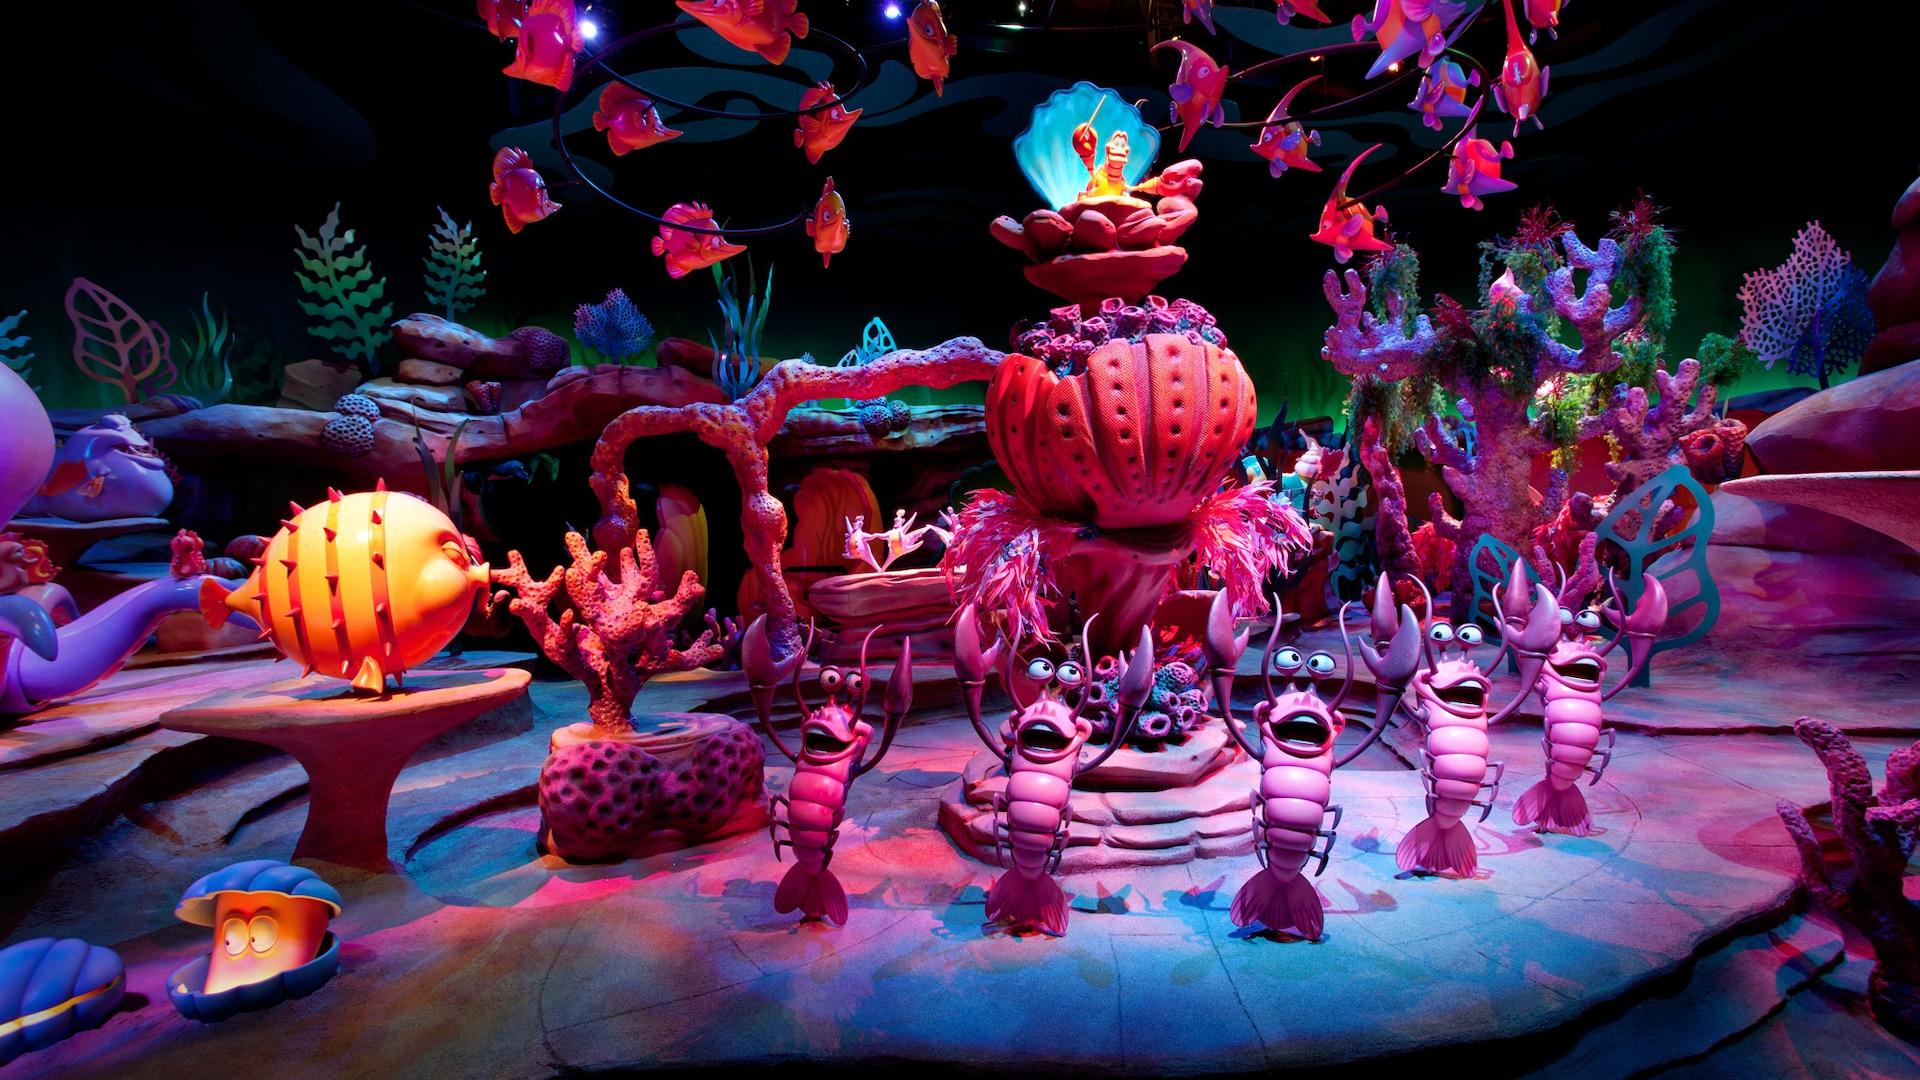 The Little Mermaid - Ariel's Undersea Adventure | California Adventure Park | Disneyland Resort